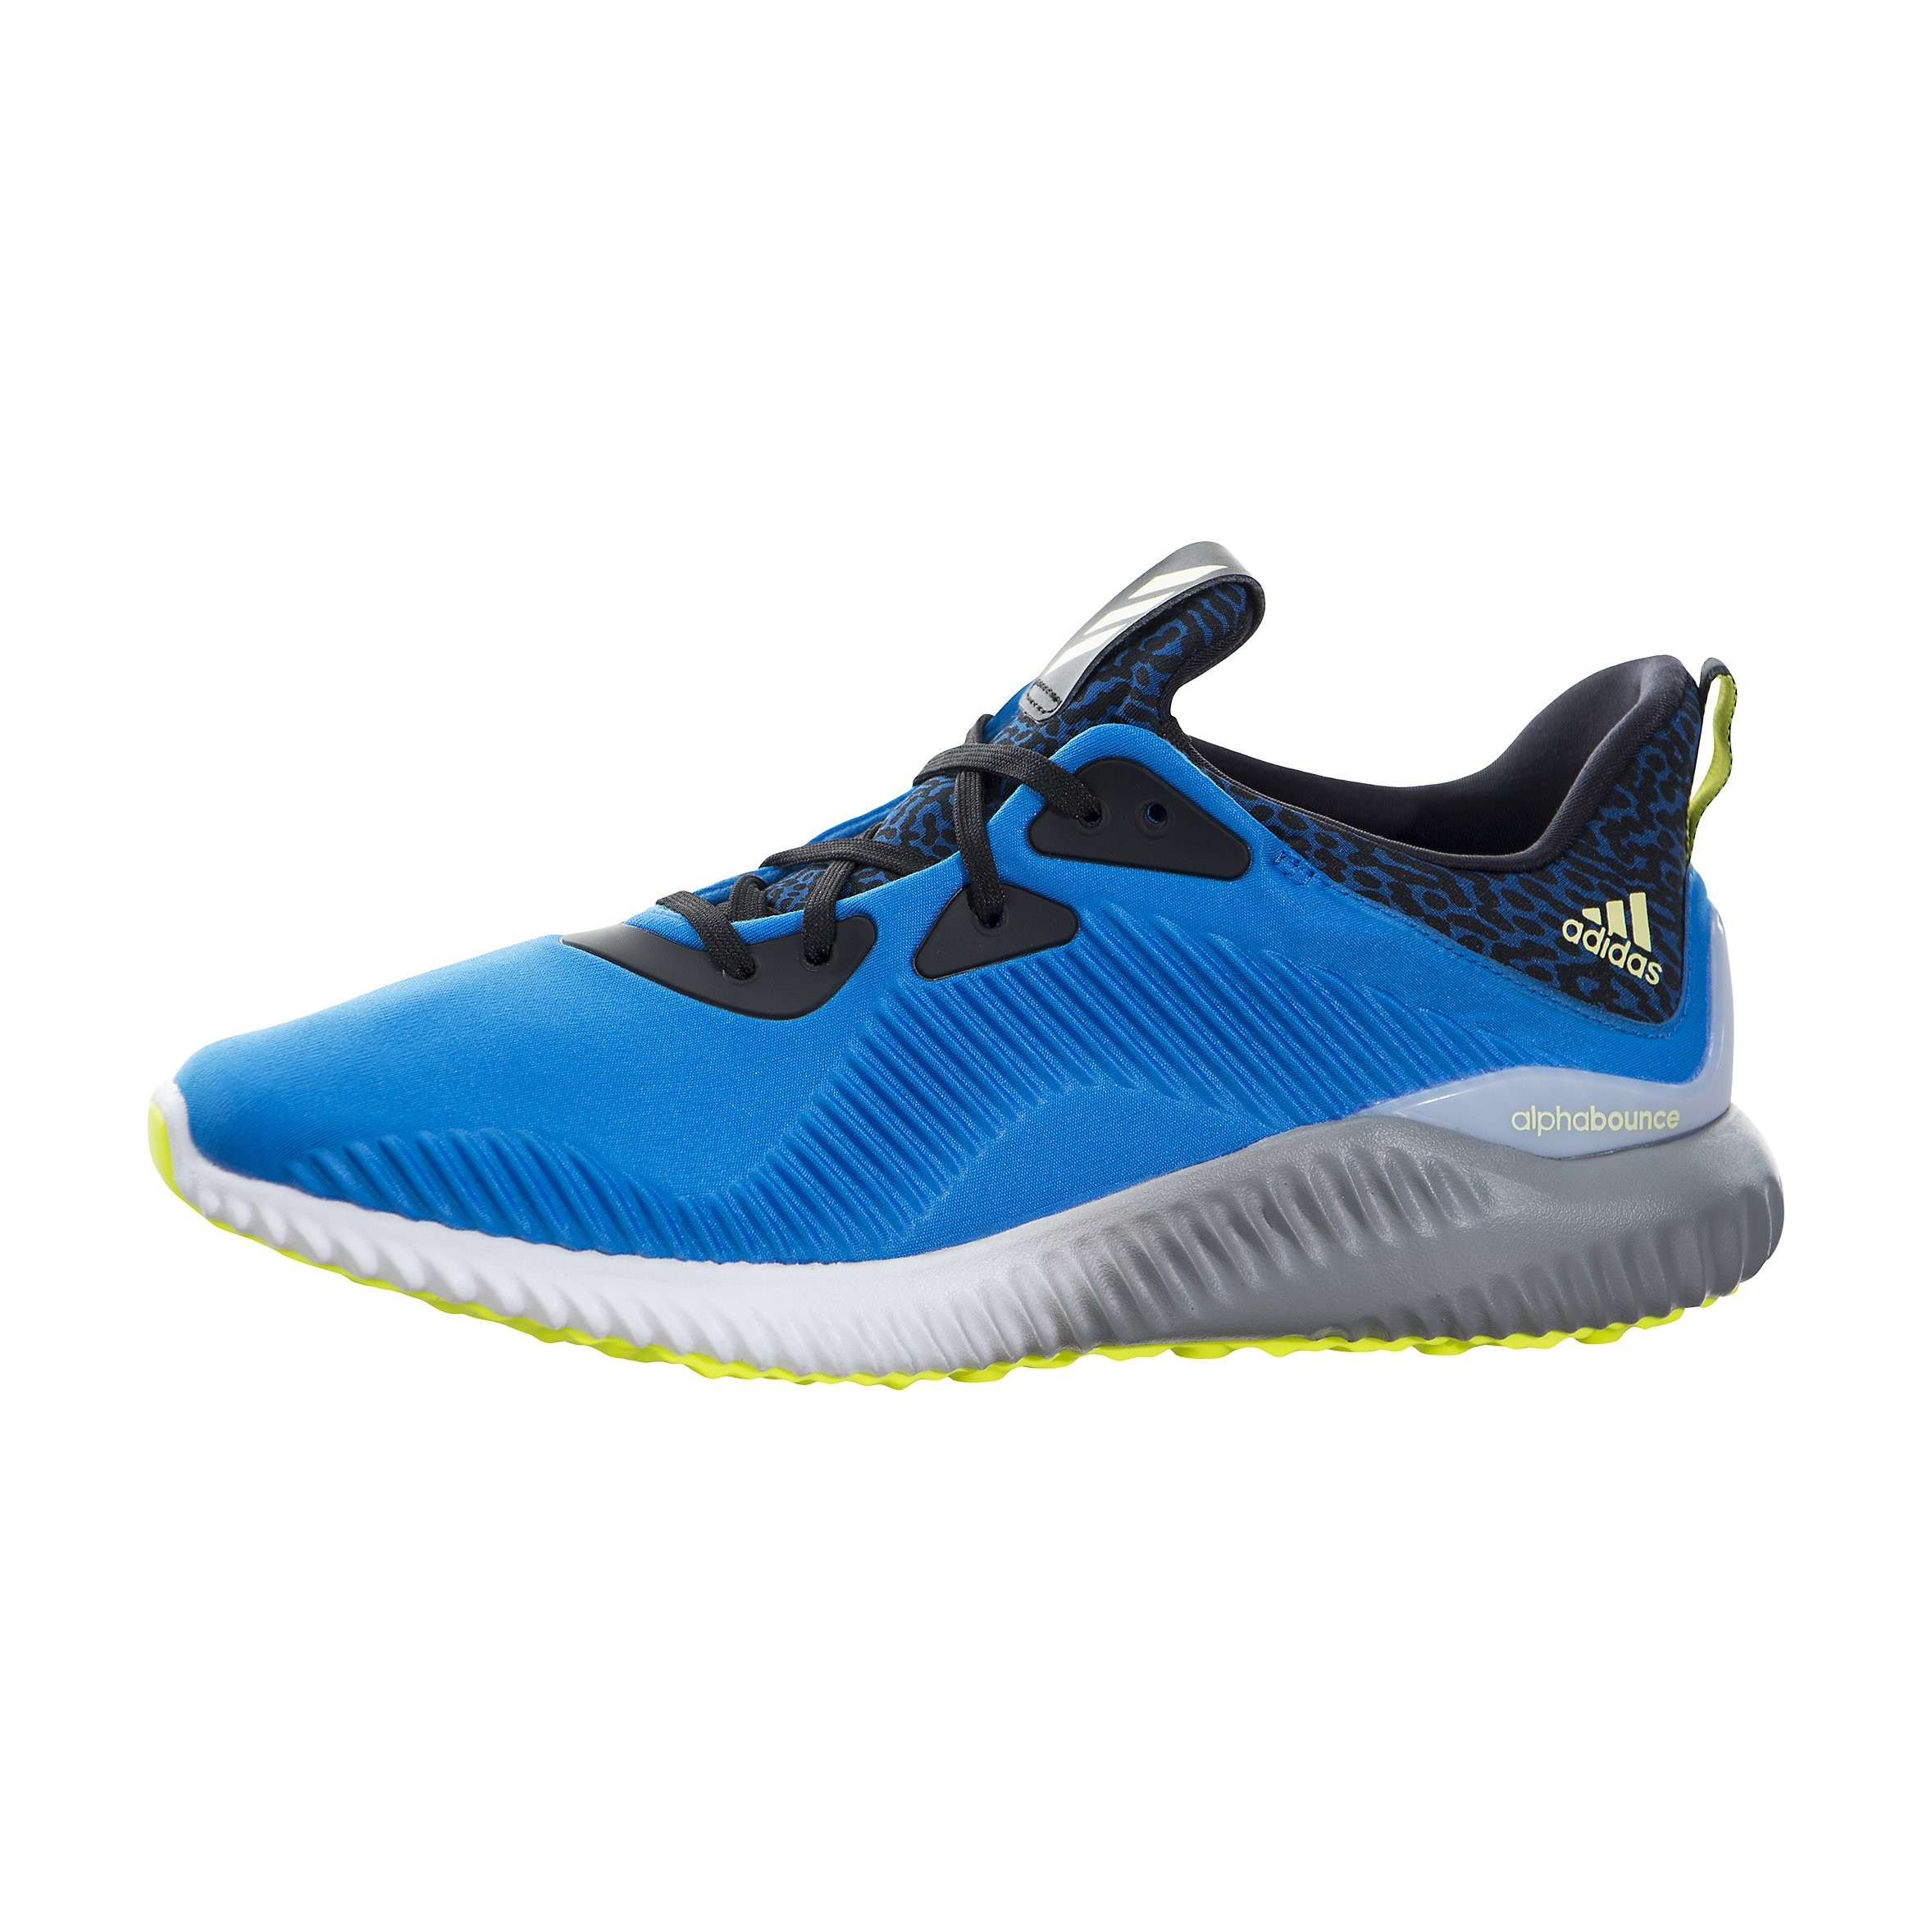 adidas Alphabounce Hombre Corriendo Zapatilla Azules Amarillas Grises b54187